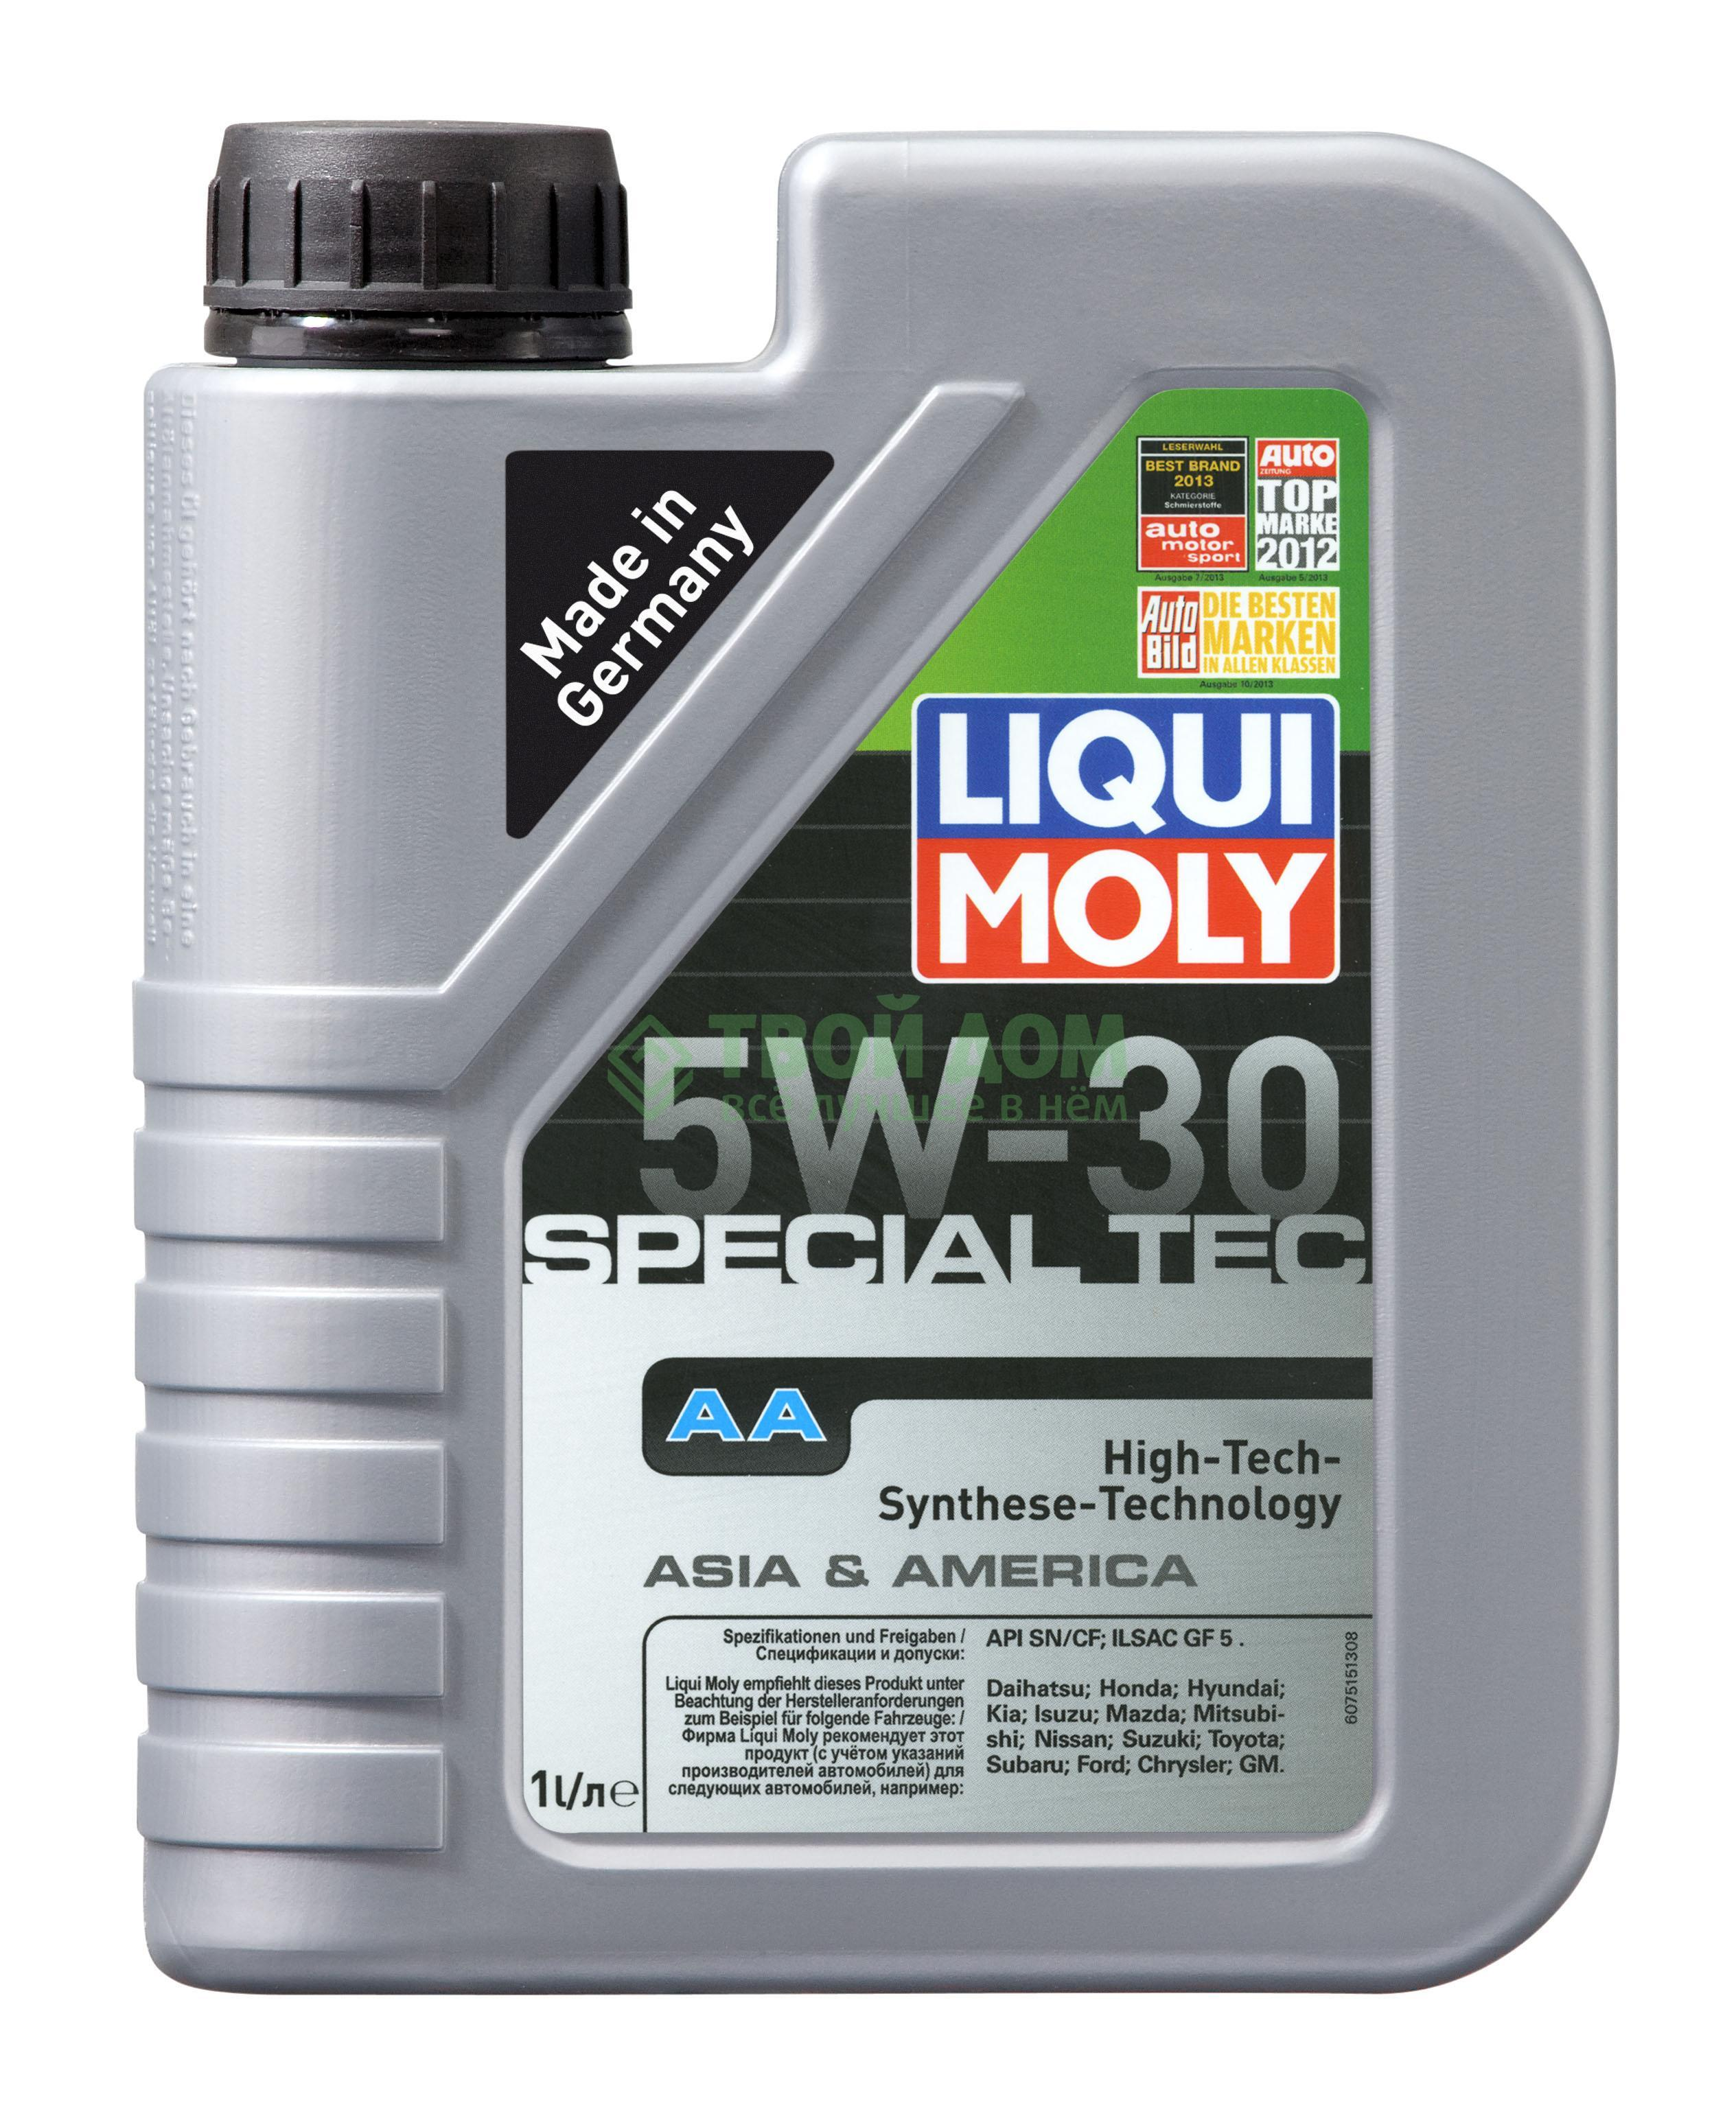 Моторное масло Liqui Moly Hc-синтетическое моторн масло sae 5w-30 (7515)